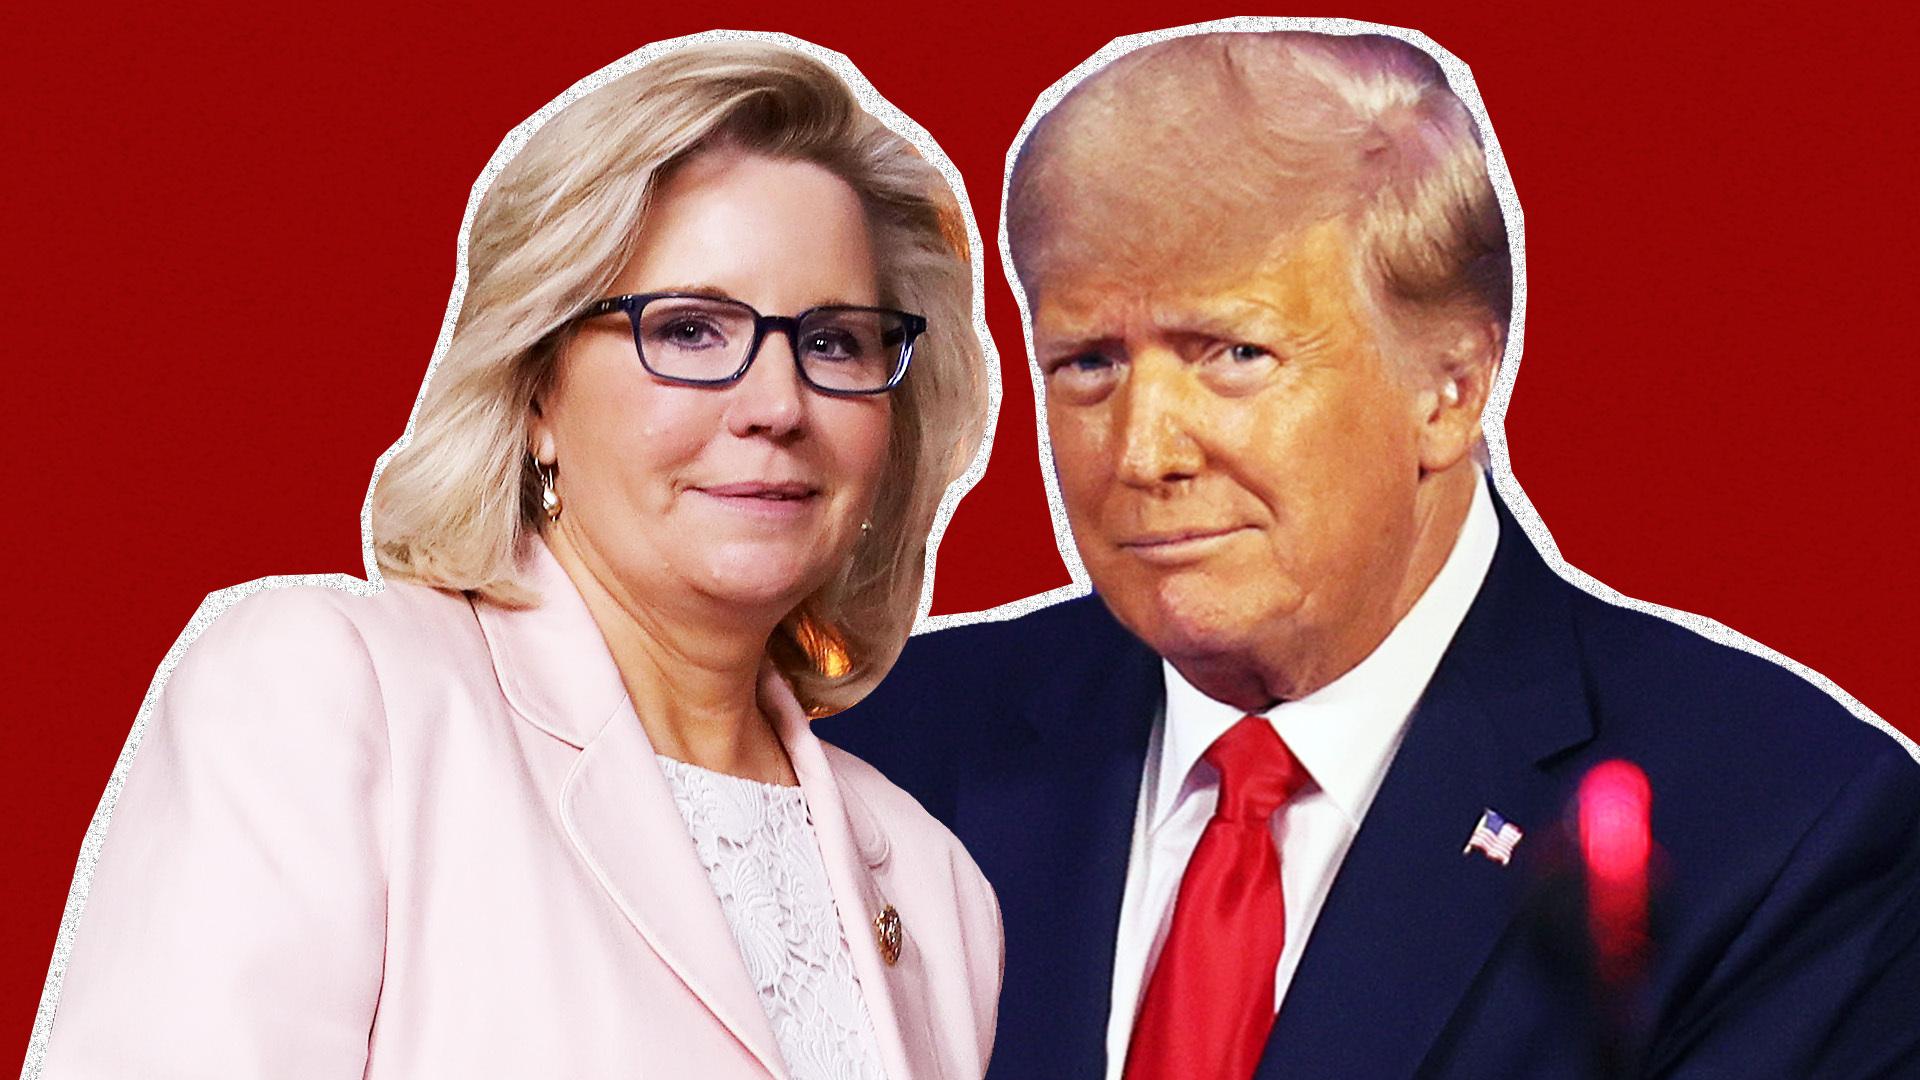 Liz Cheney and Donald Trump